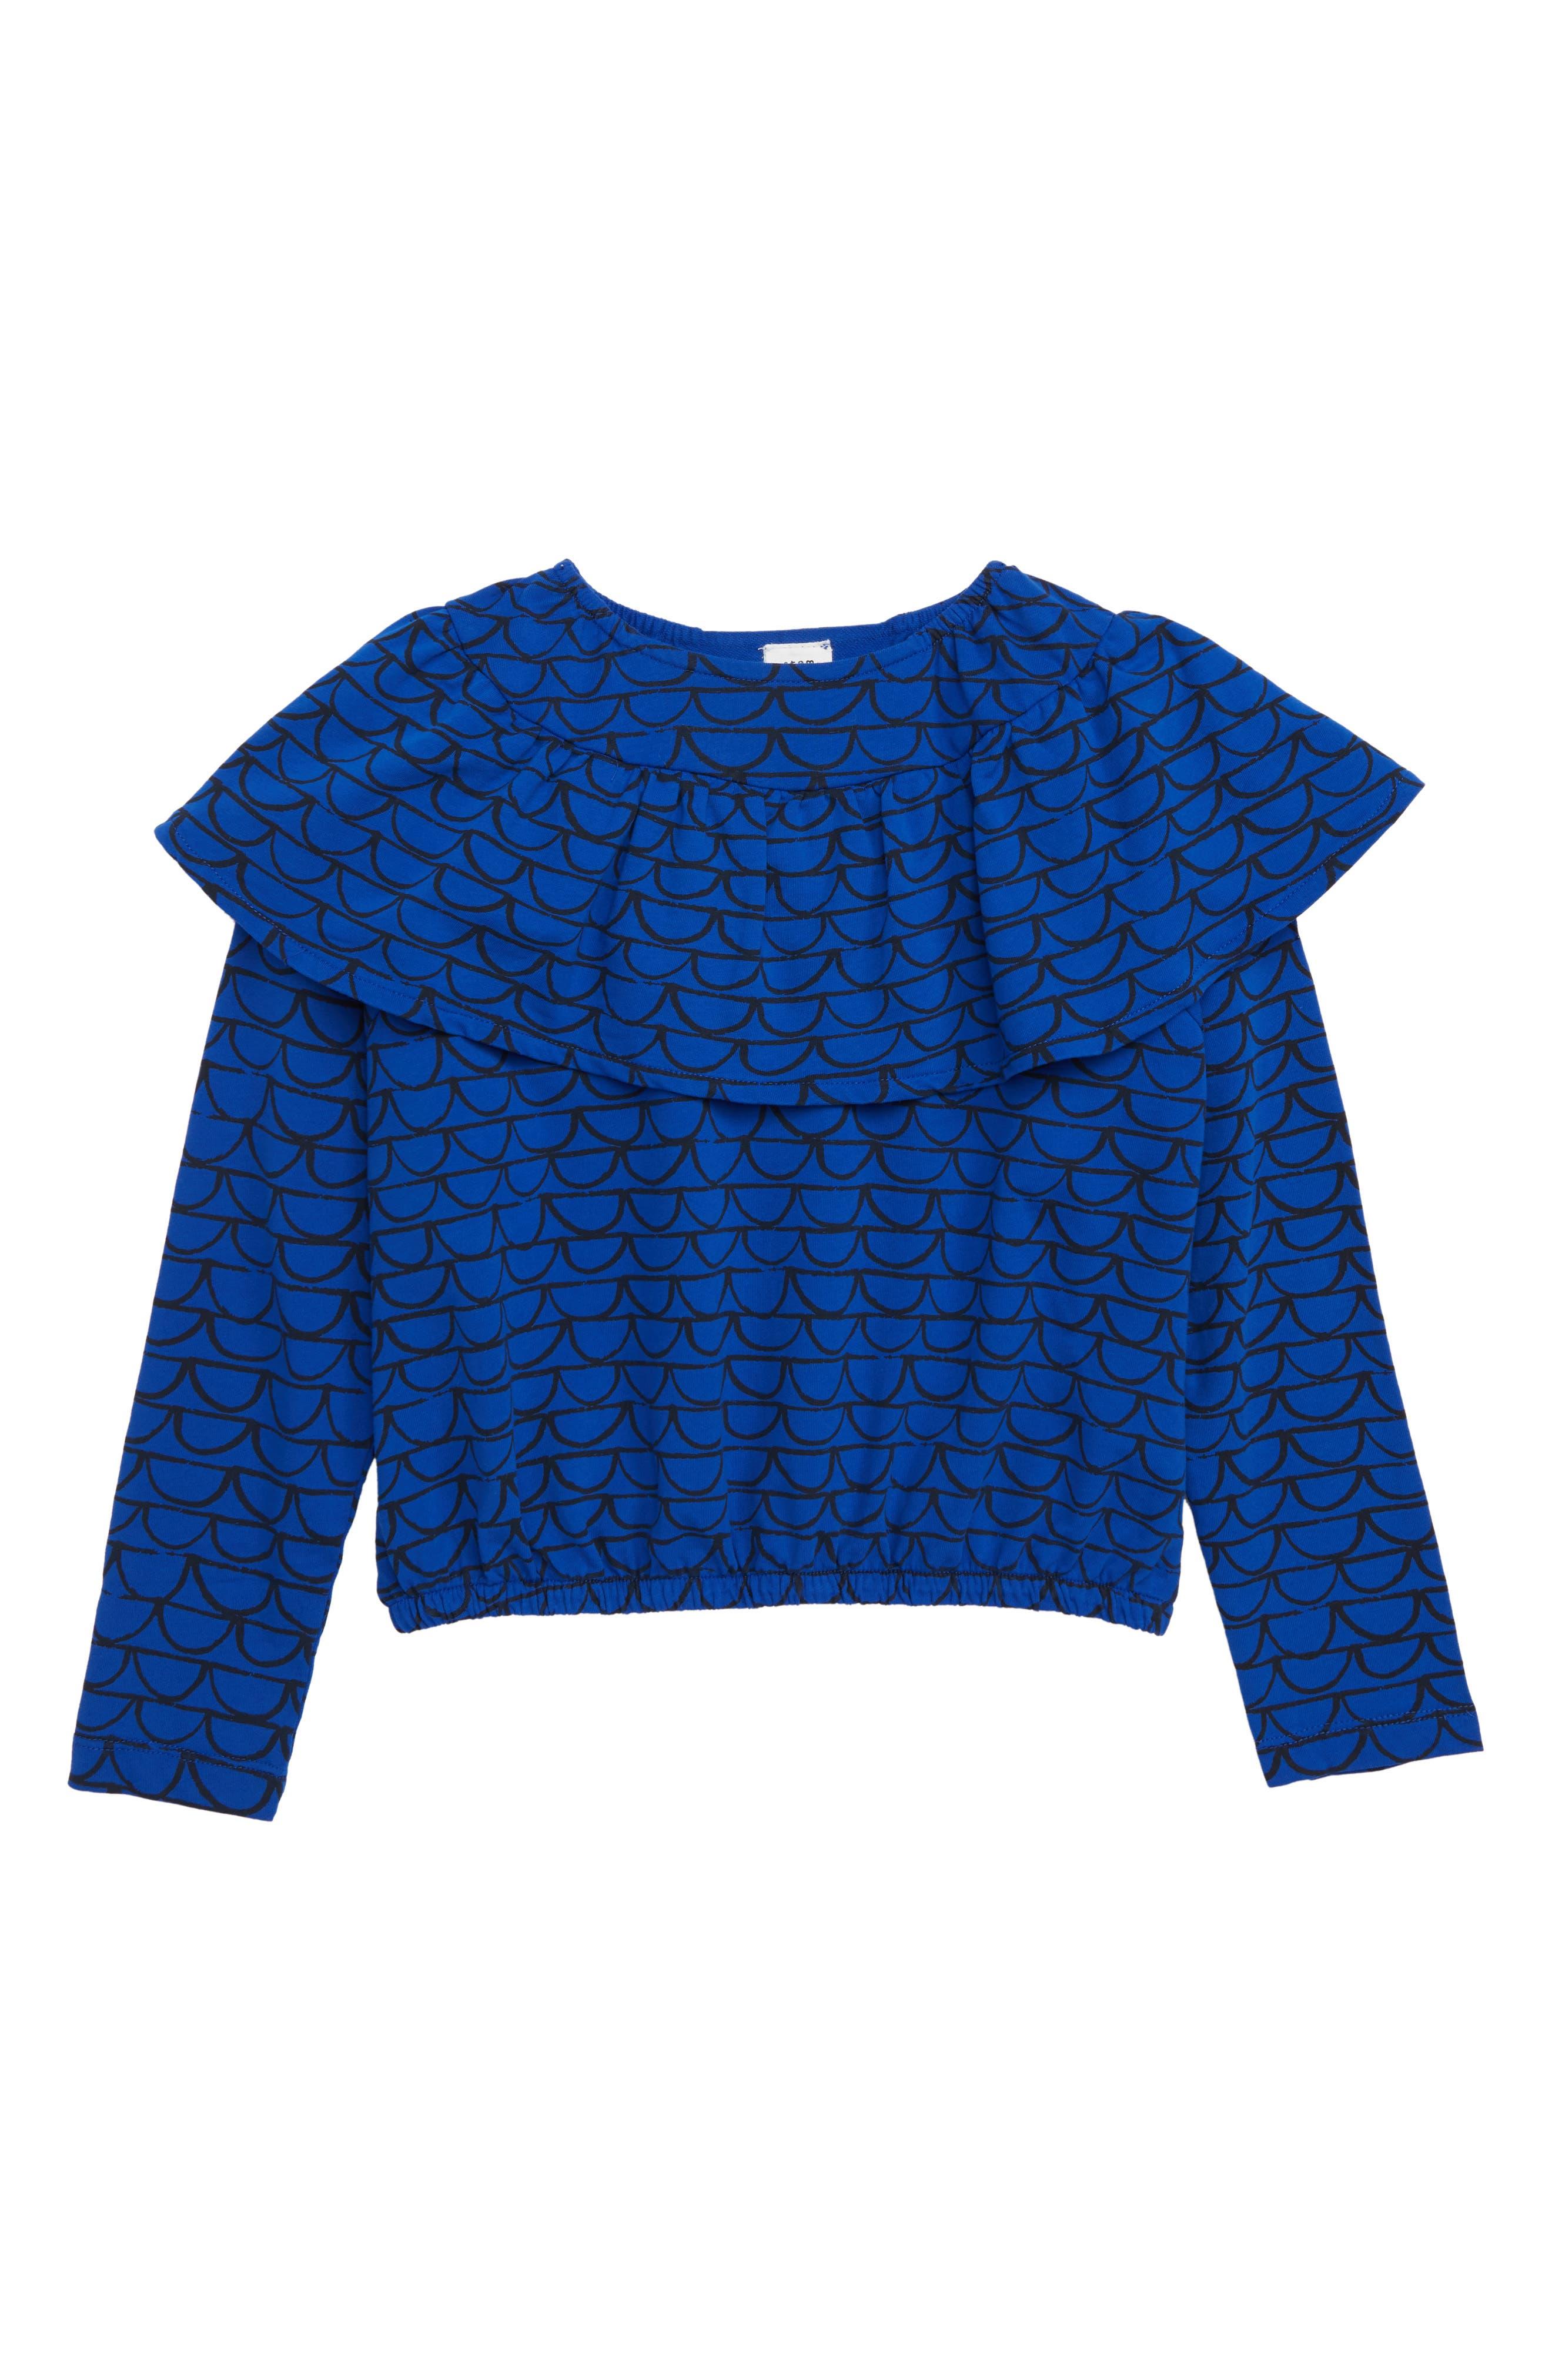 Ruffle Top,                         Main,                         color, BLUE MAZARINE SCALLOPS